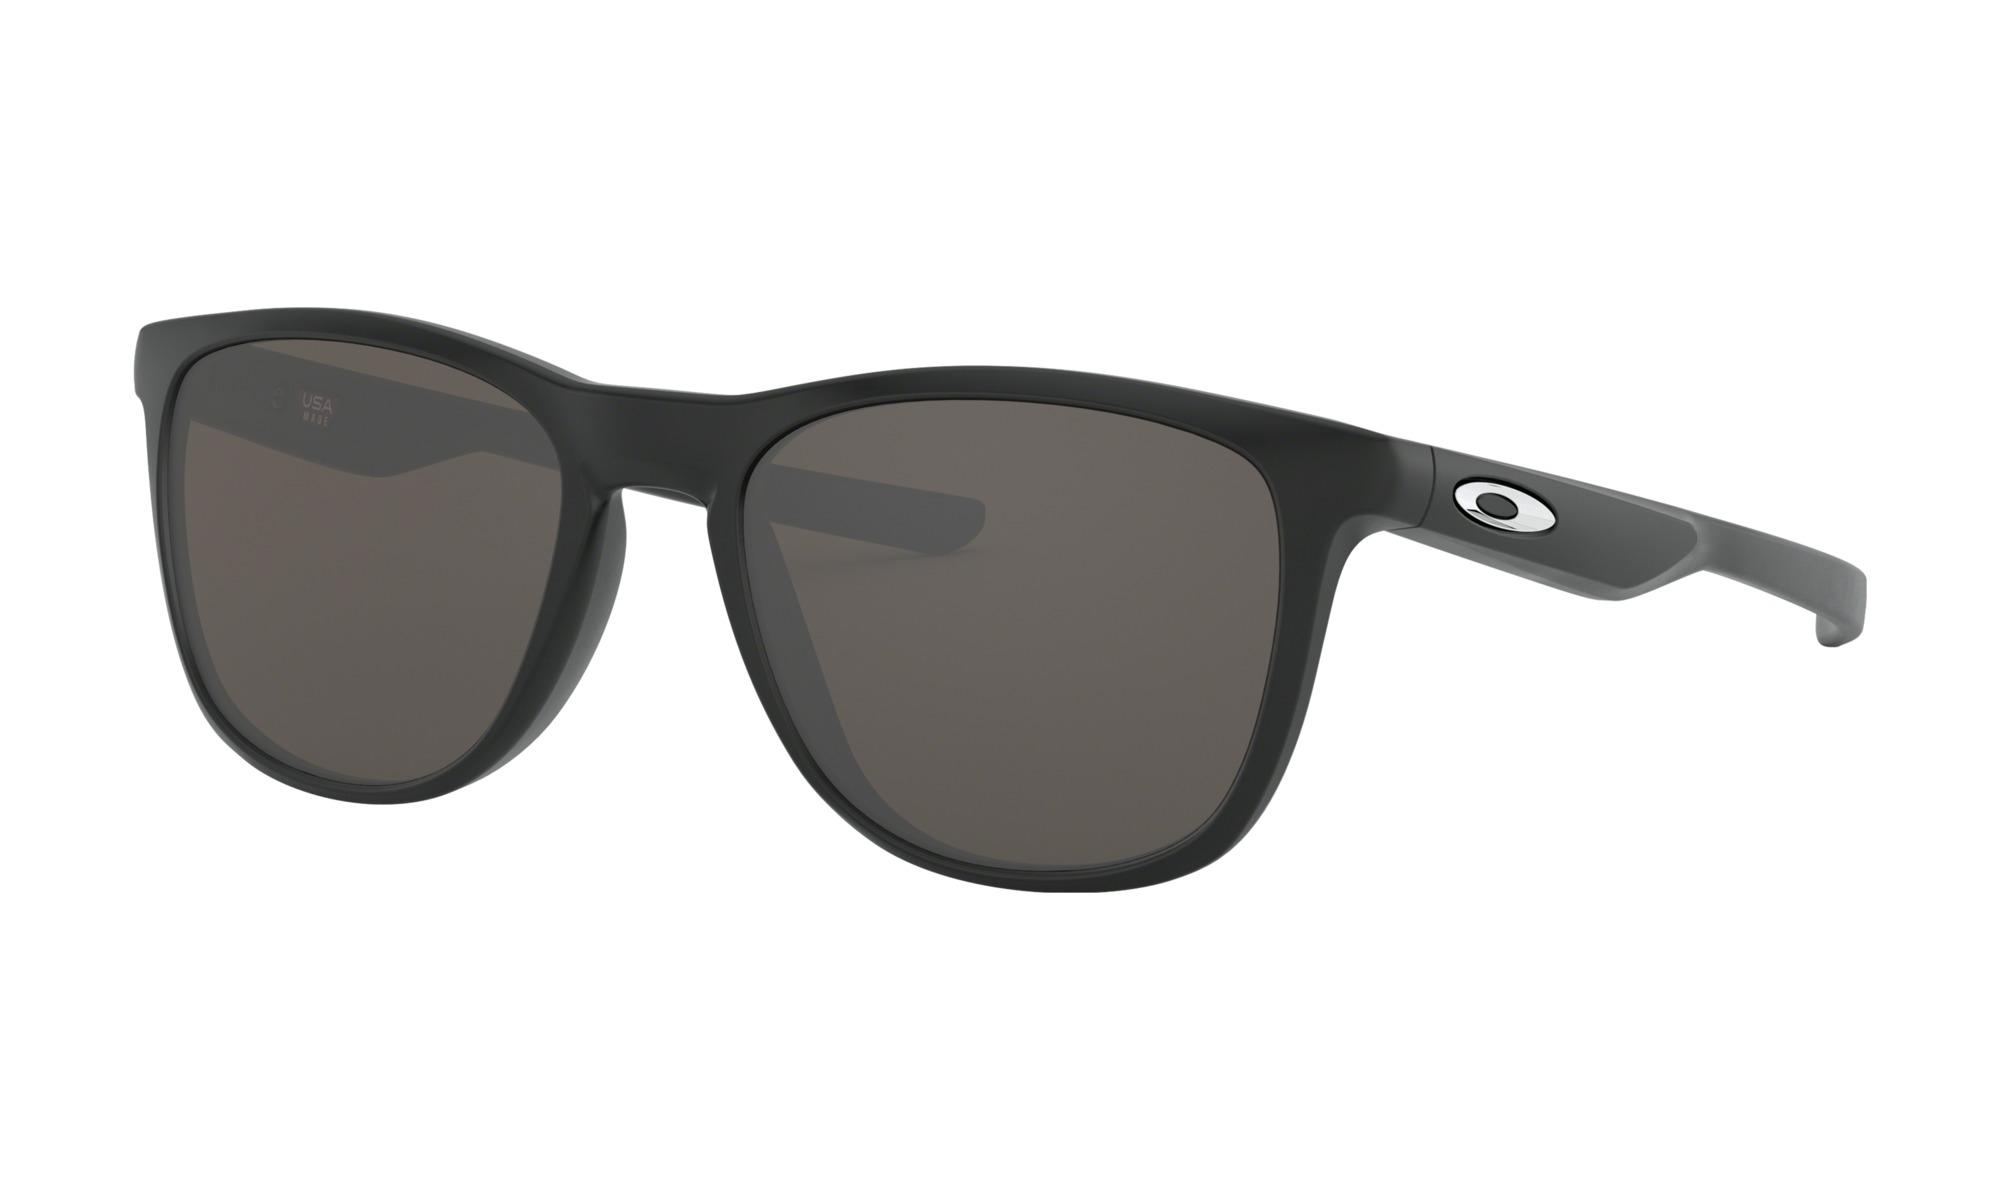 c03ad71e3ed Oakley OO9340-01 Trillbe X Matte Black Frame   Warm Gray Lenses Sunglasses  - Brand New. oo9340-01-1.jpg